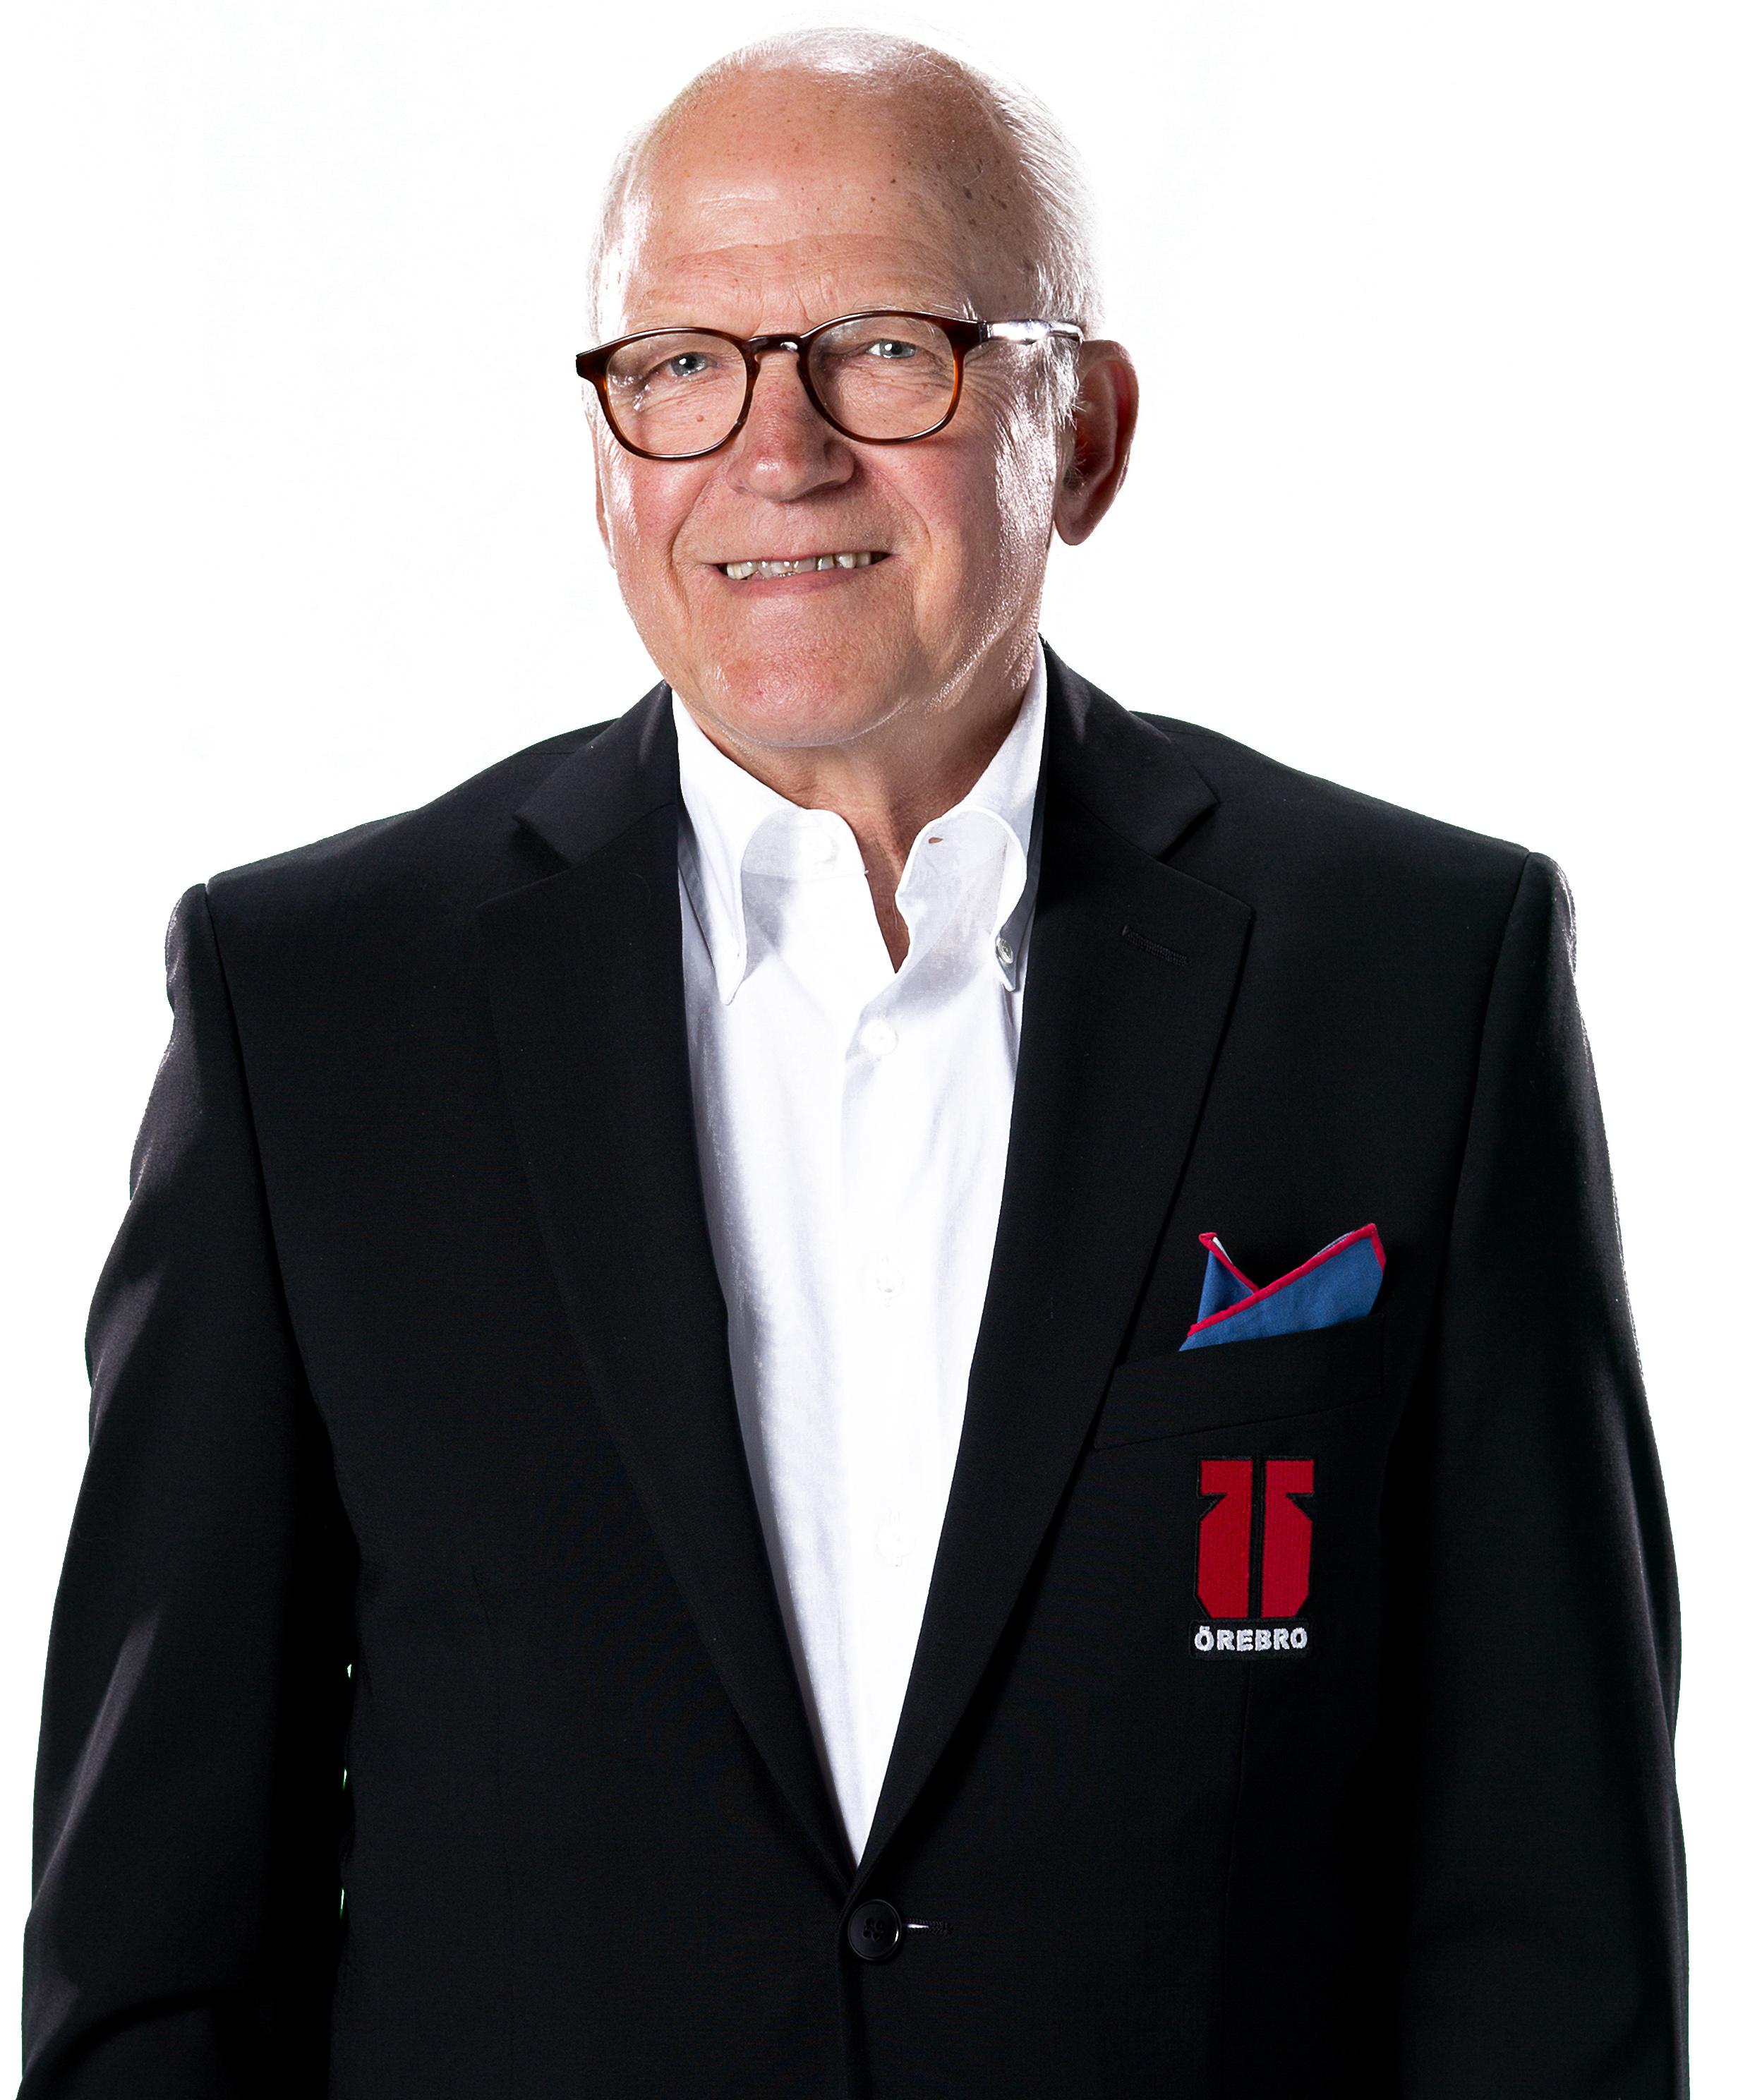 Ulf Marcusson